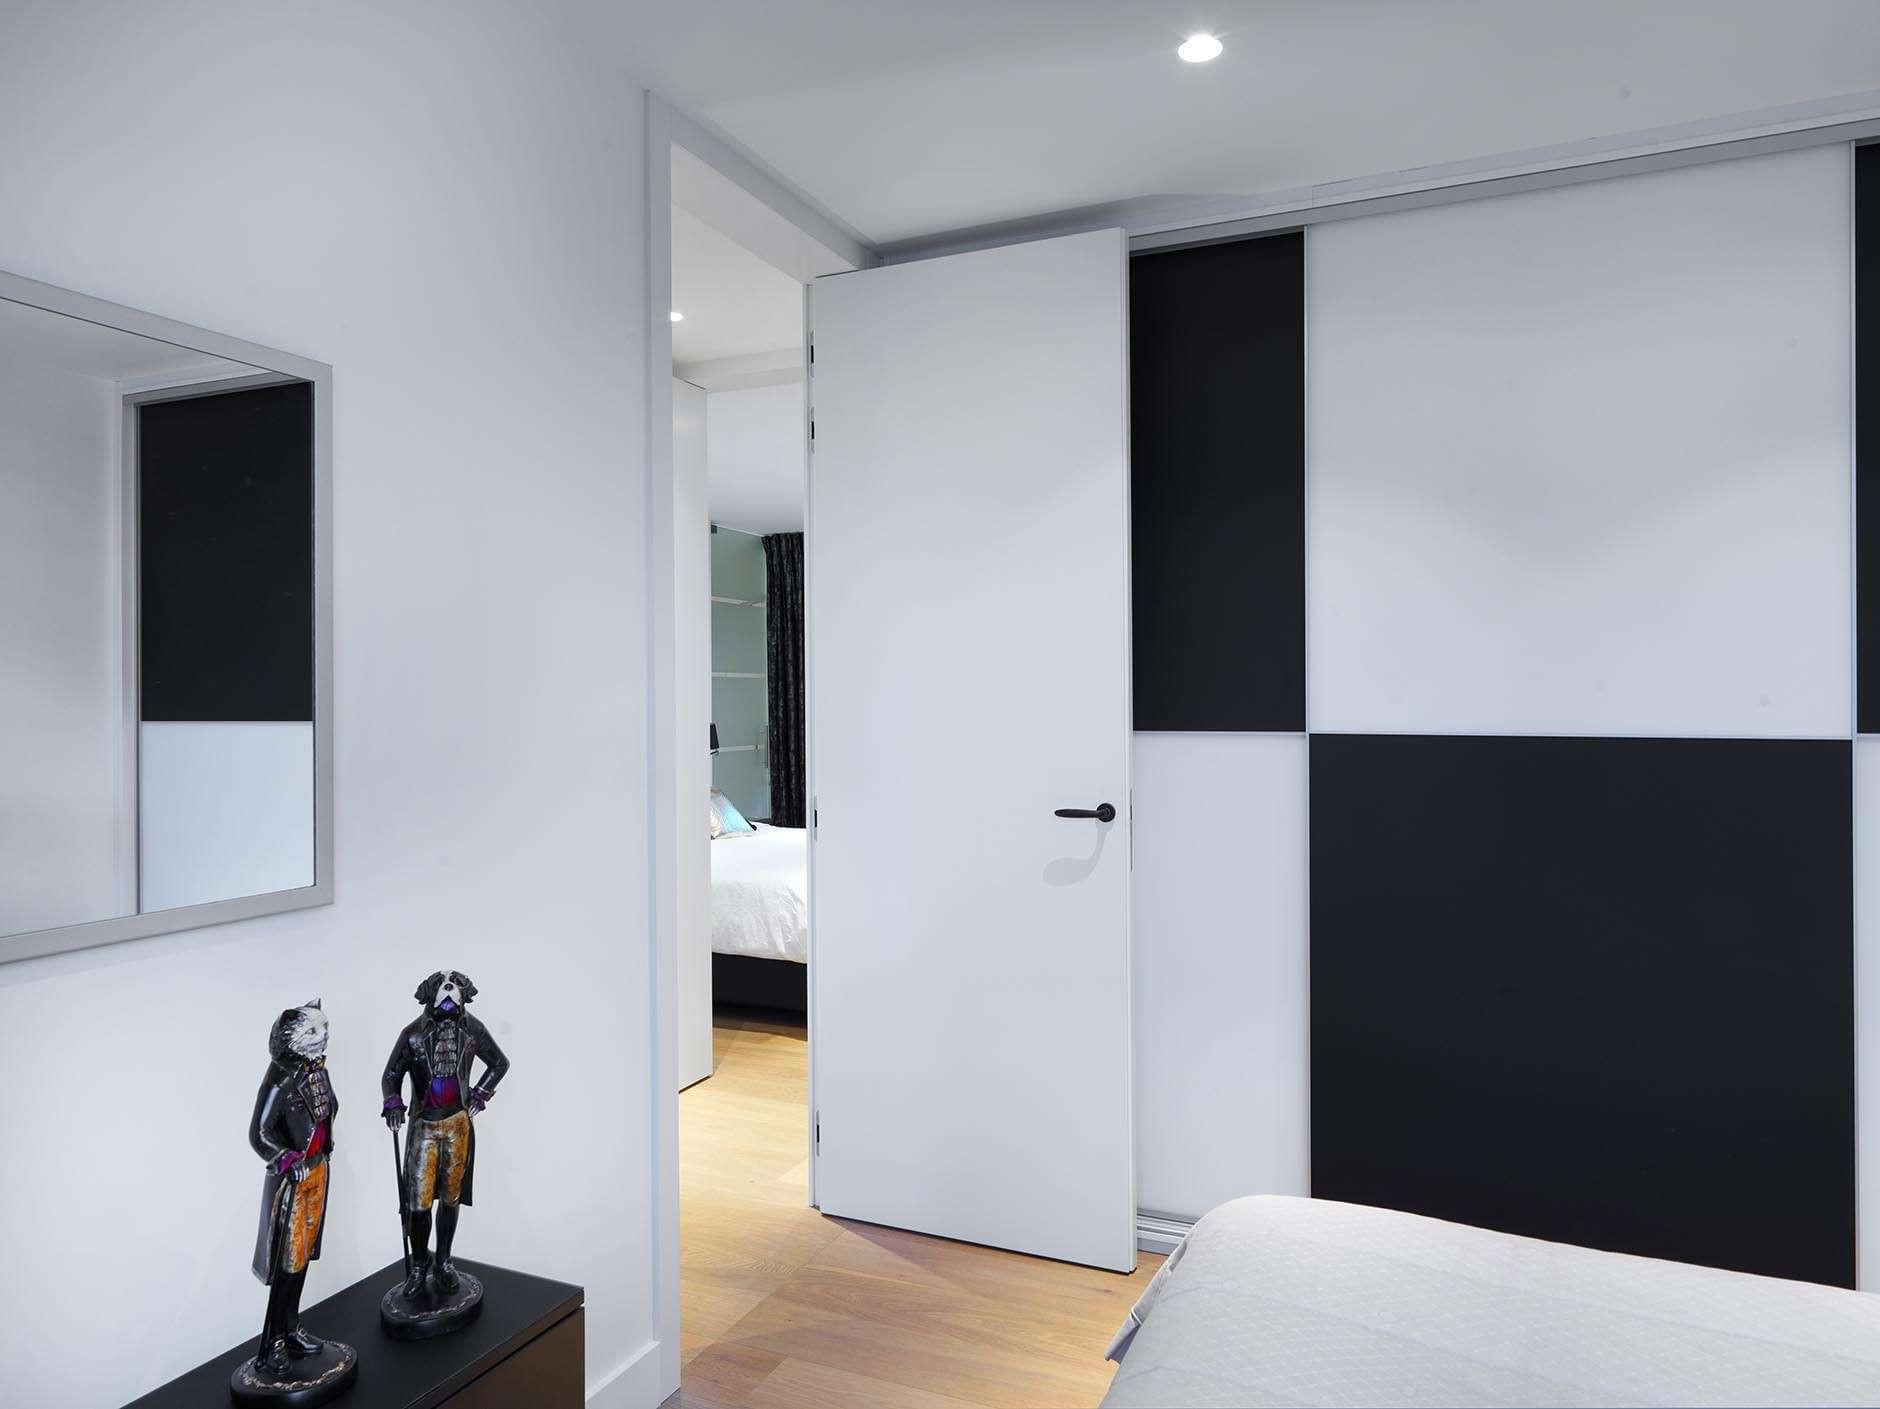 zwart-wit-interieur-binnendeur